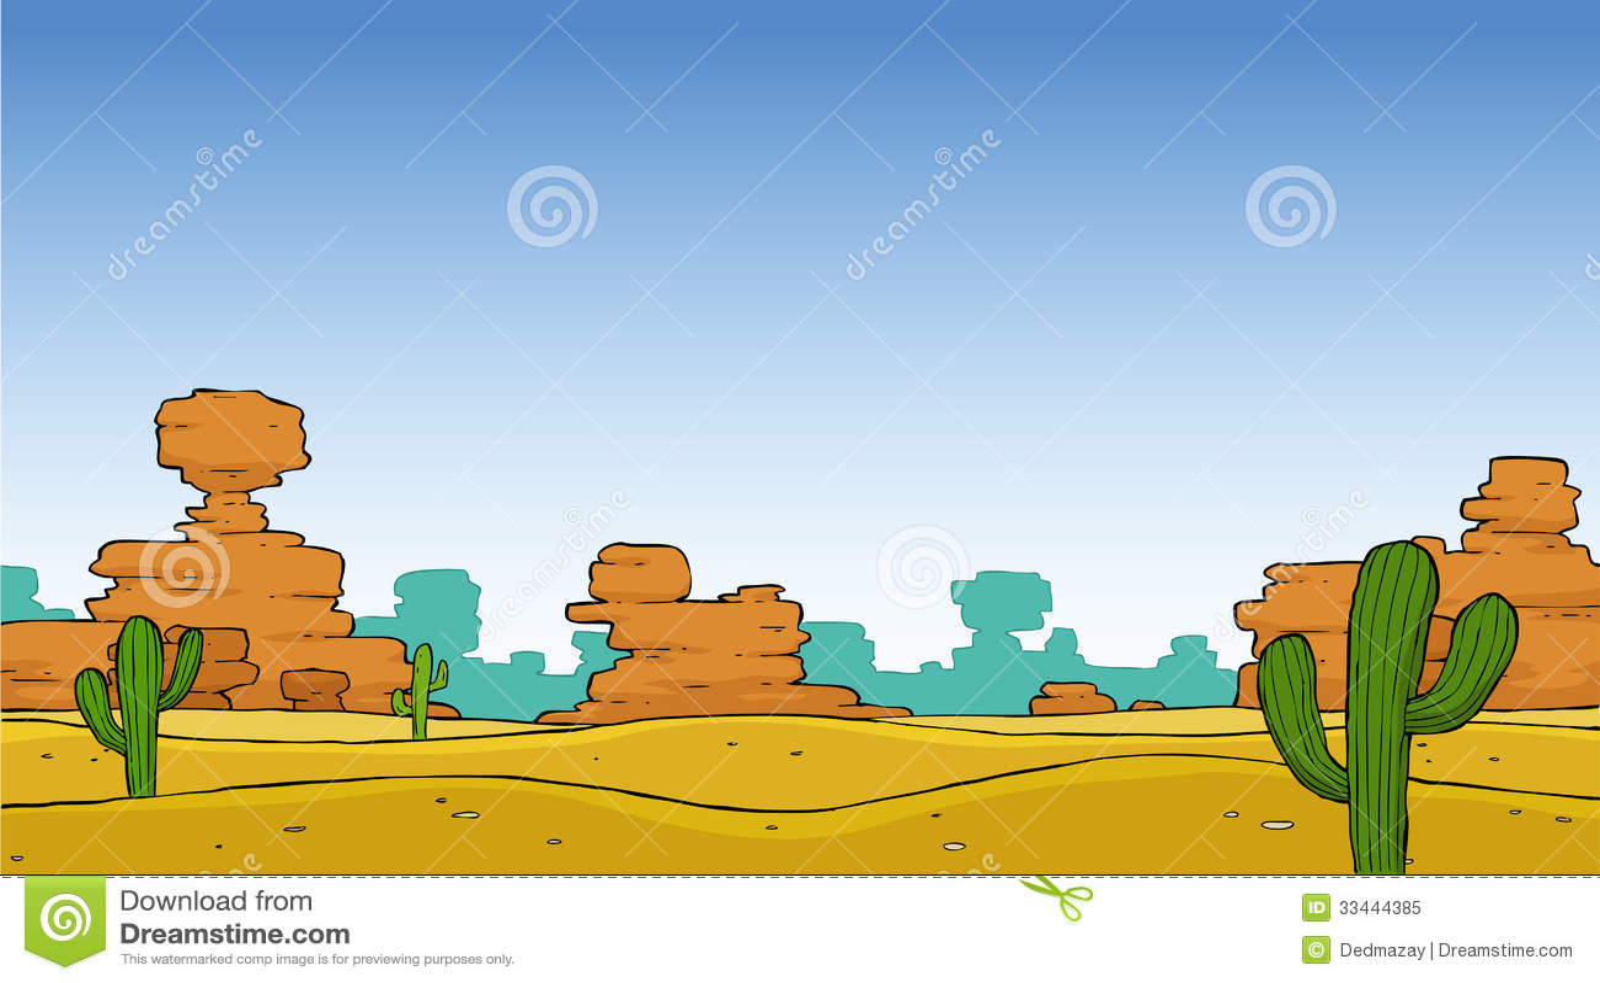 Landscape Illustration Vector Free: Desert Stock Vector. Illustration Of Environment, Cute